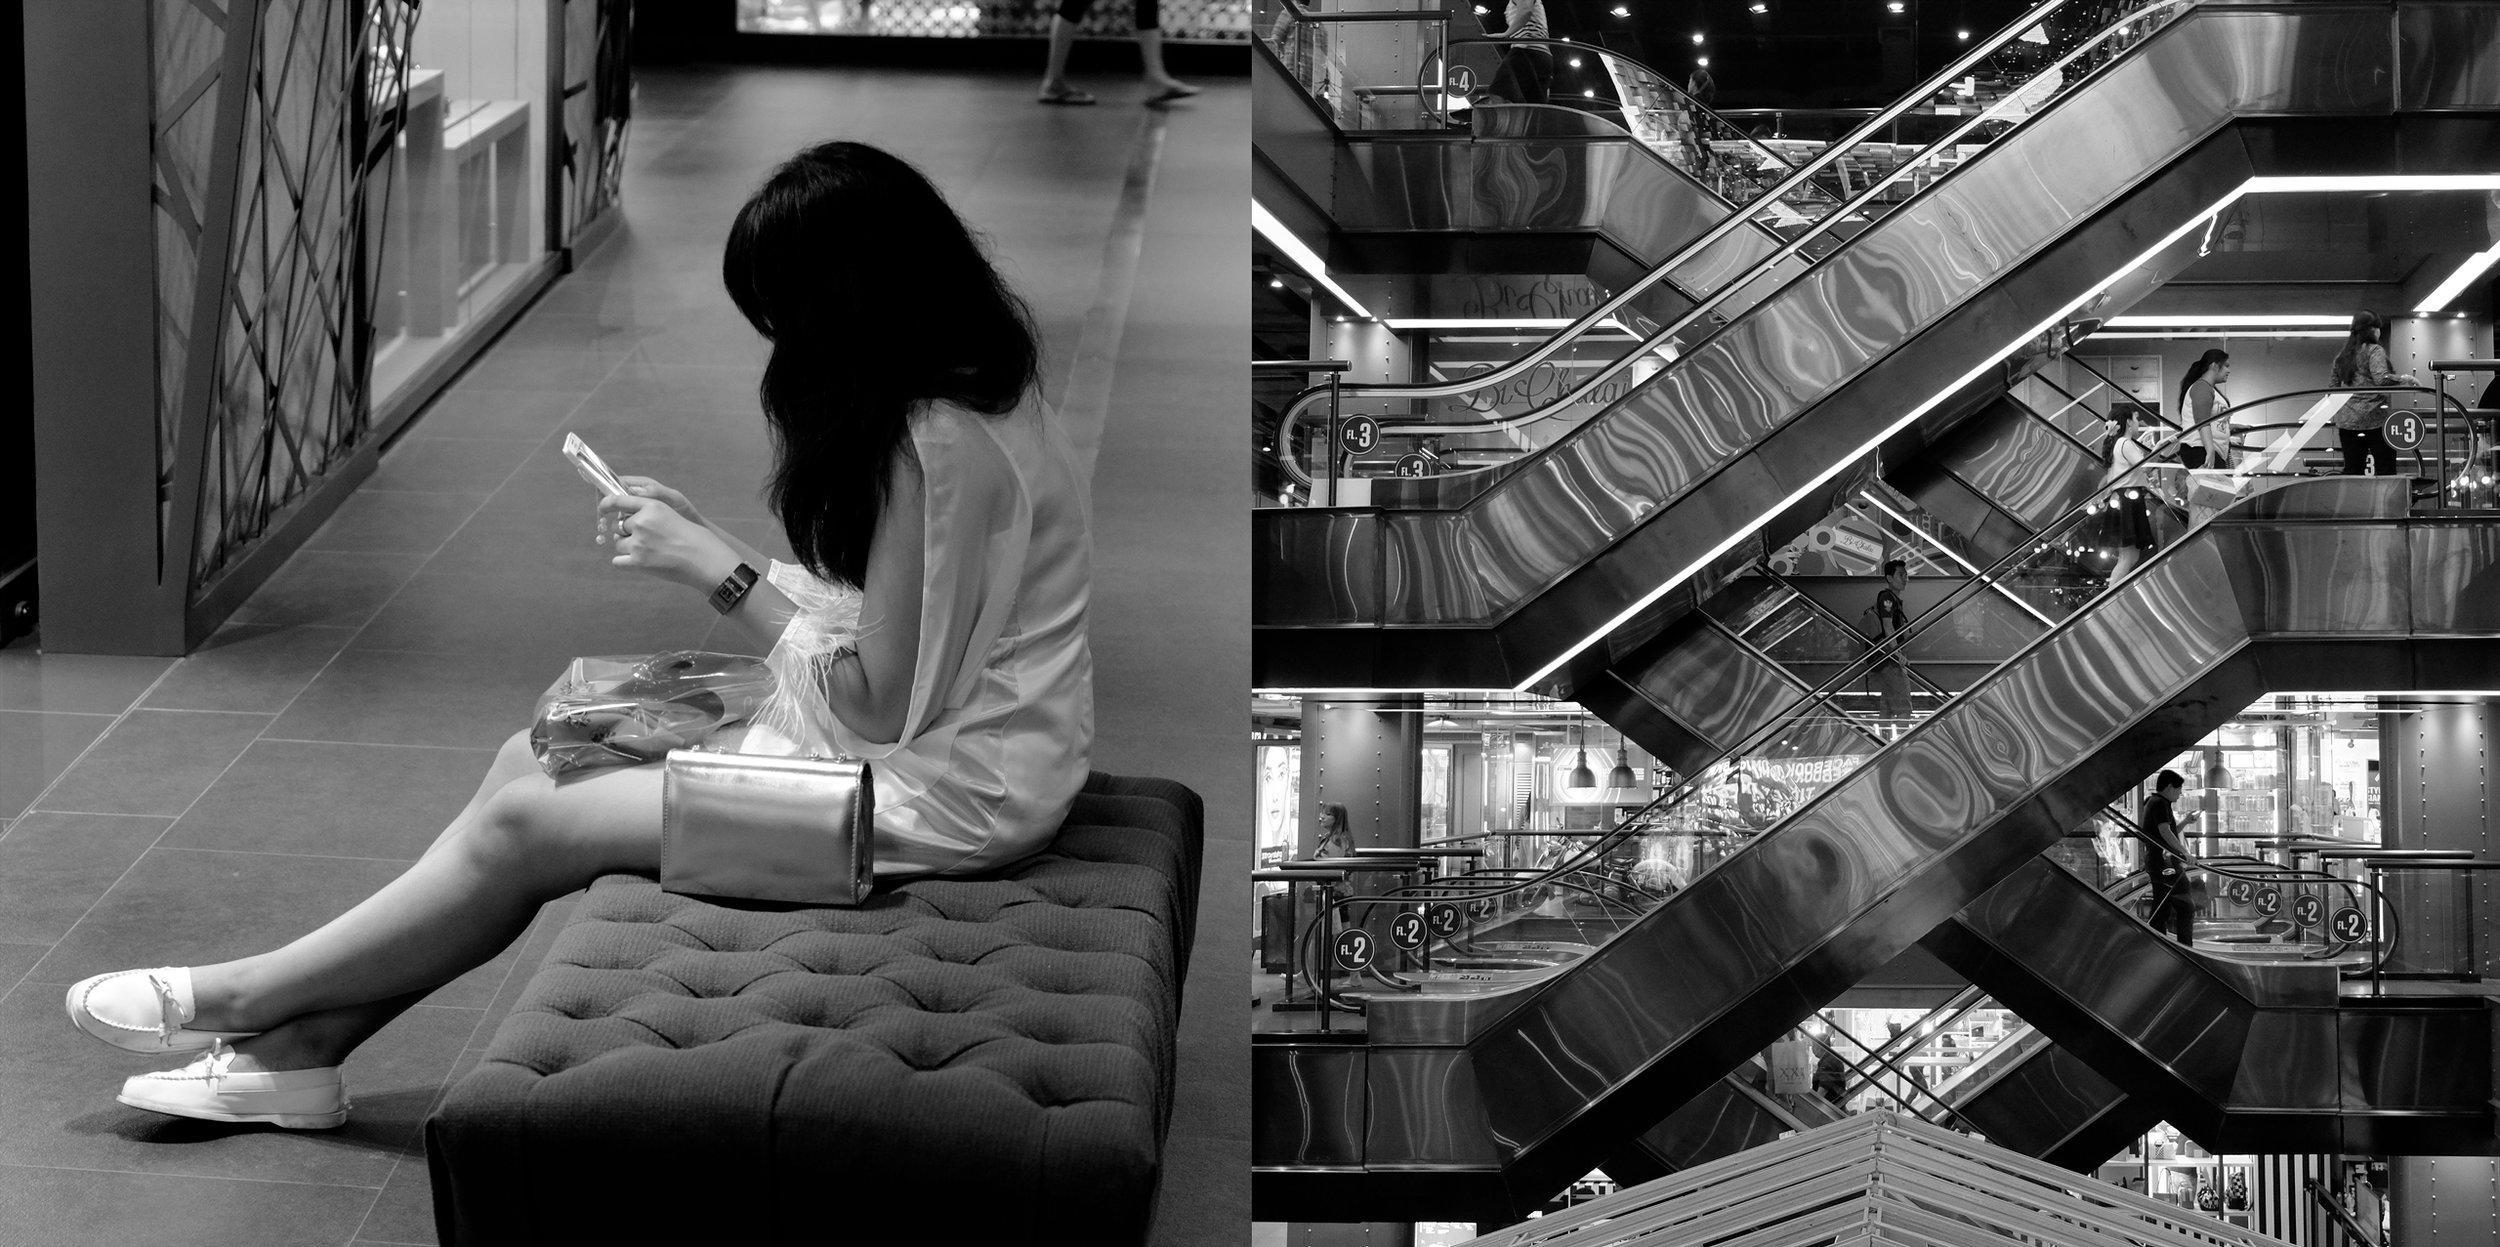 Immaculate Girl and Escalator, 2017